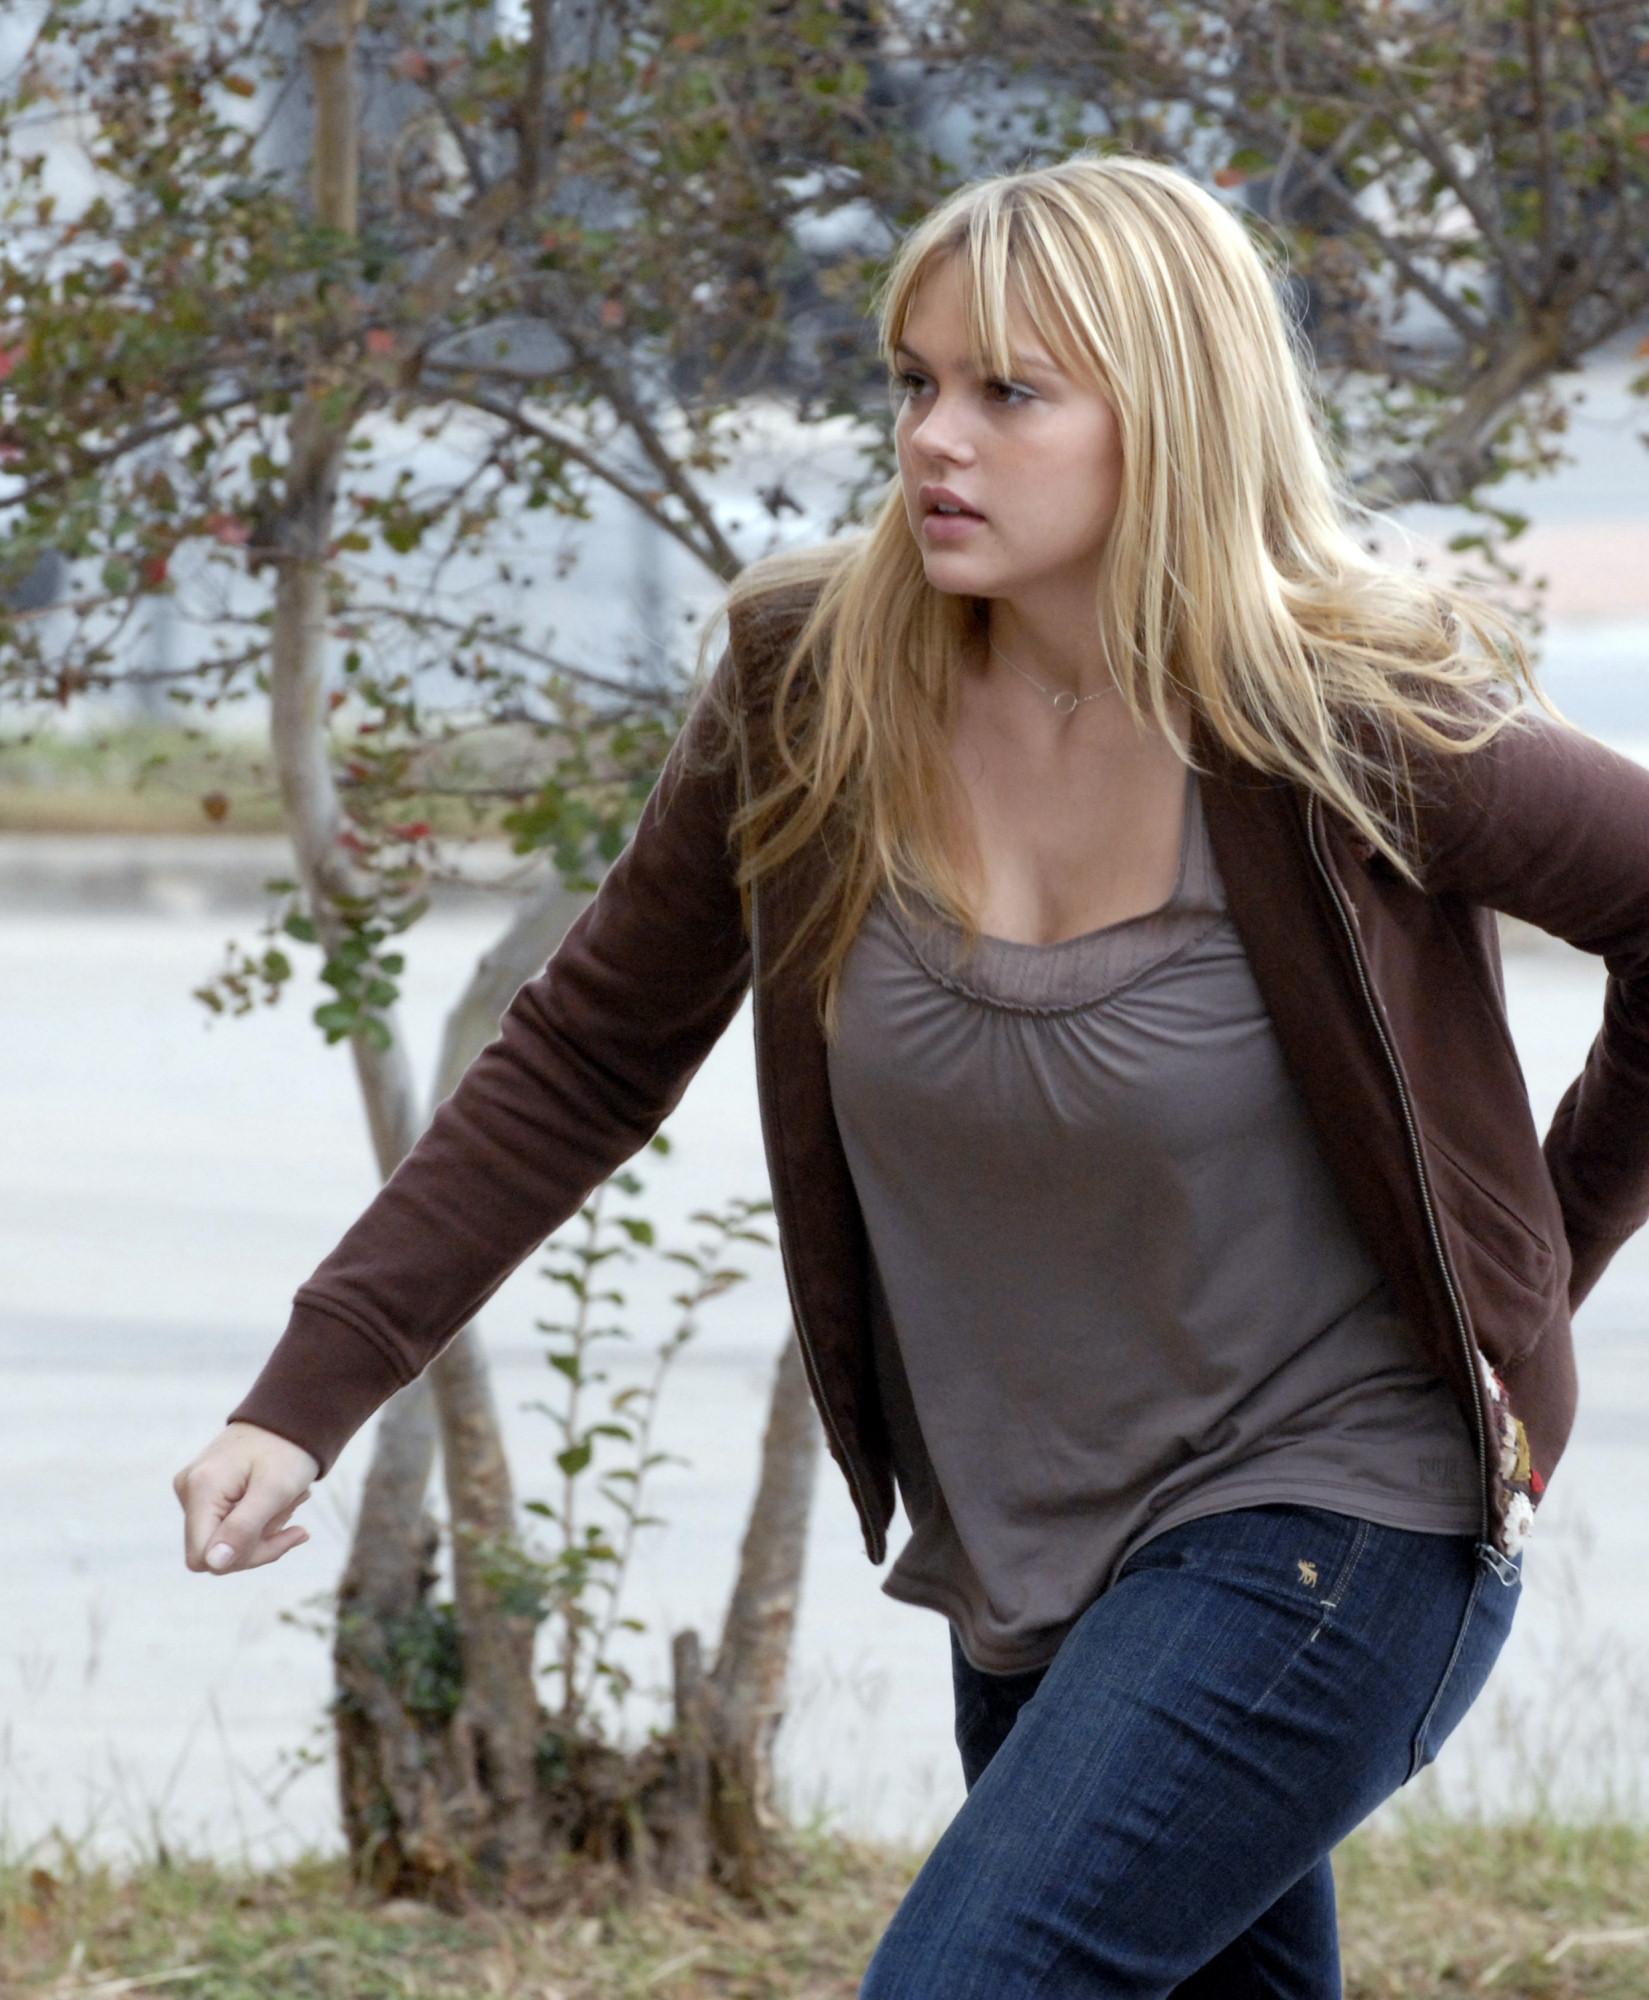 Friday Night Lights Season 2 Episode Stills - Aimee ...